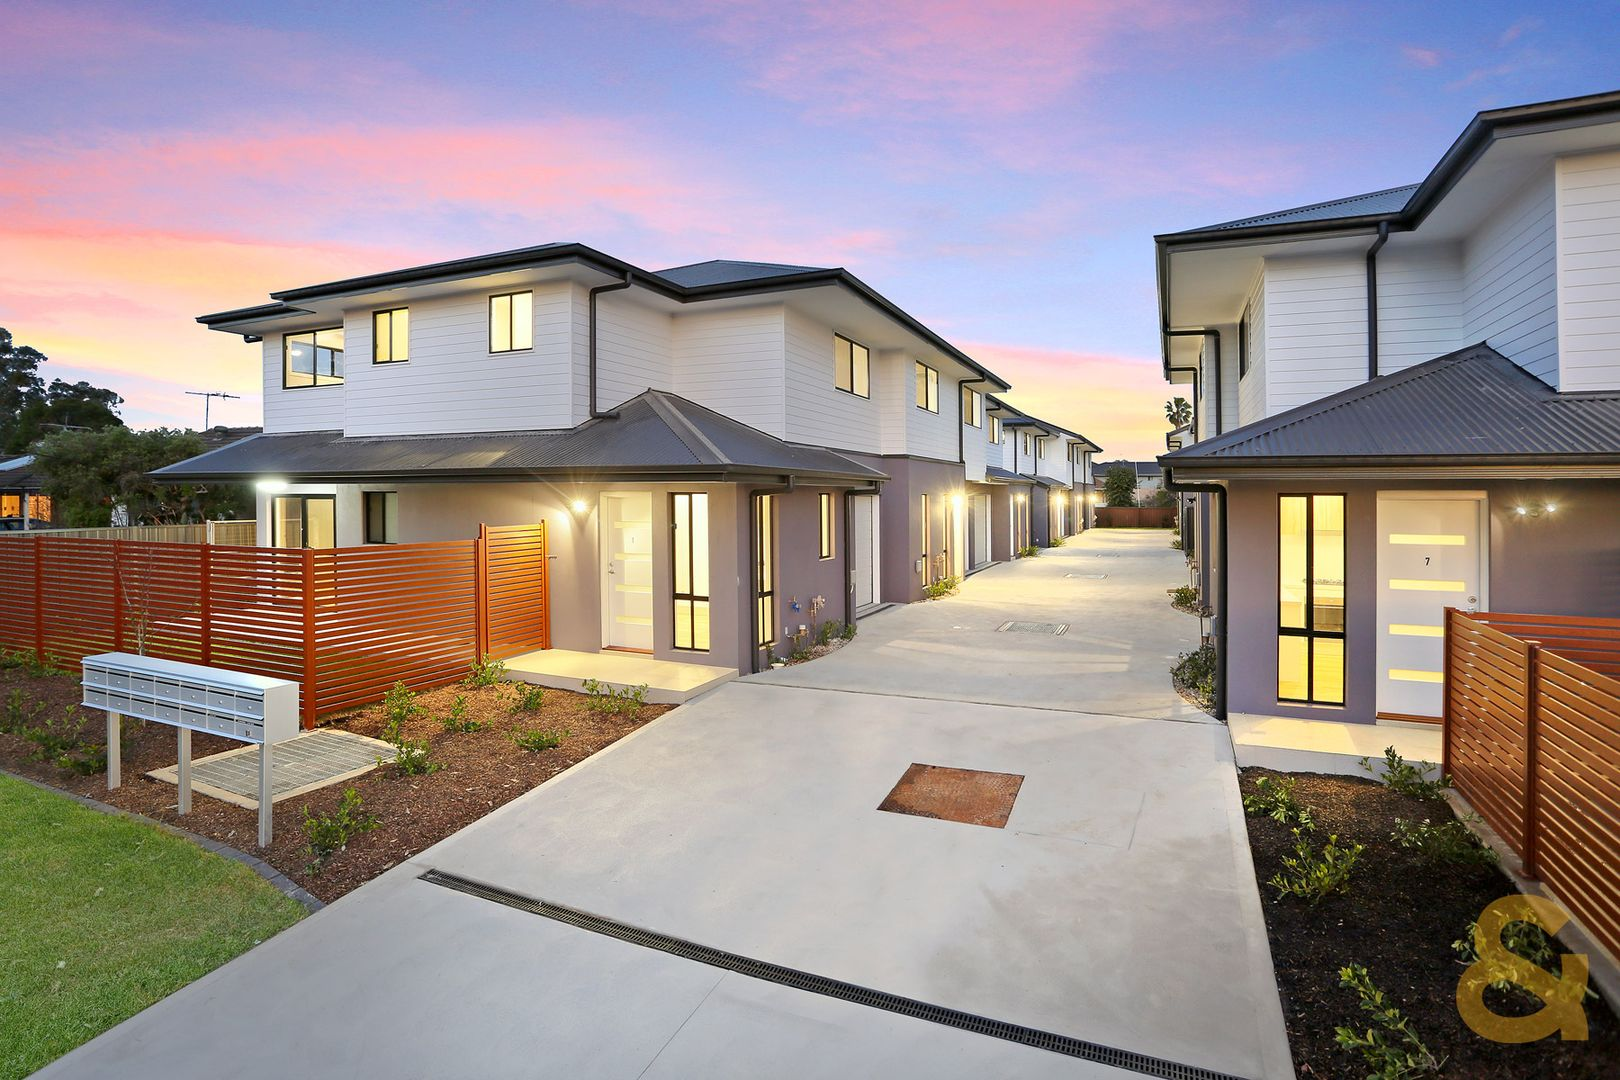 4/32-34 Lethbridge Avenue, Werrington NSW 2747, Image 0